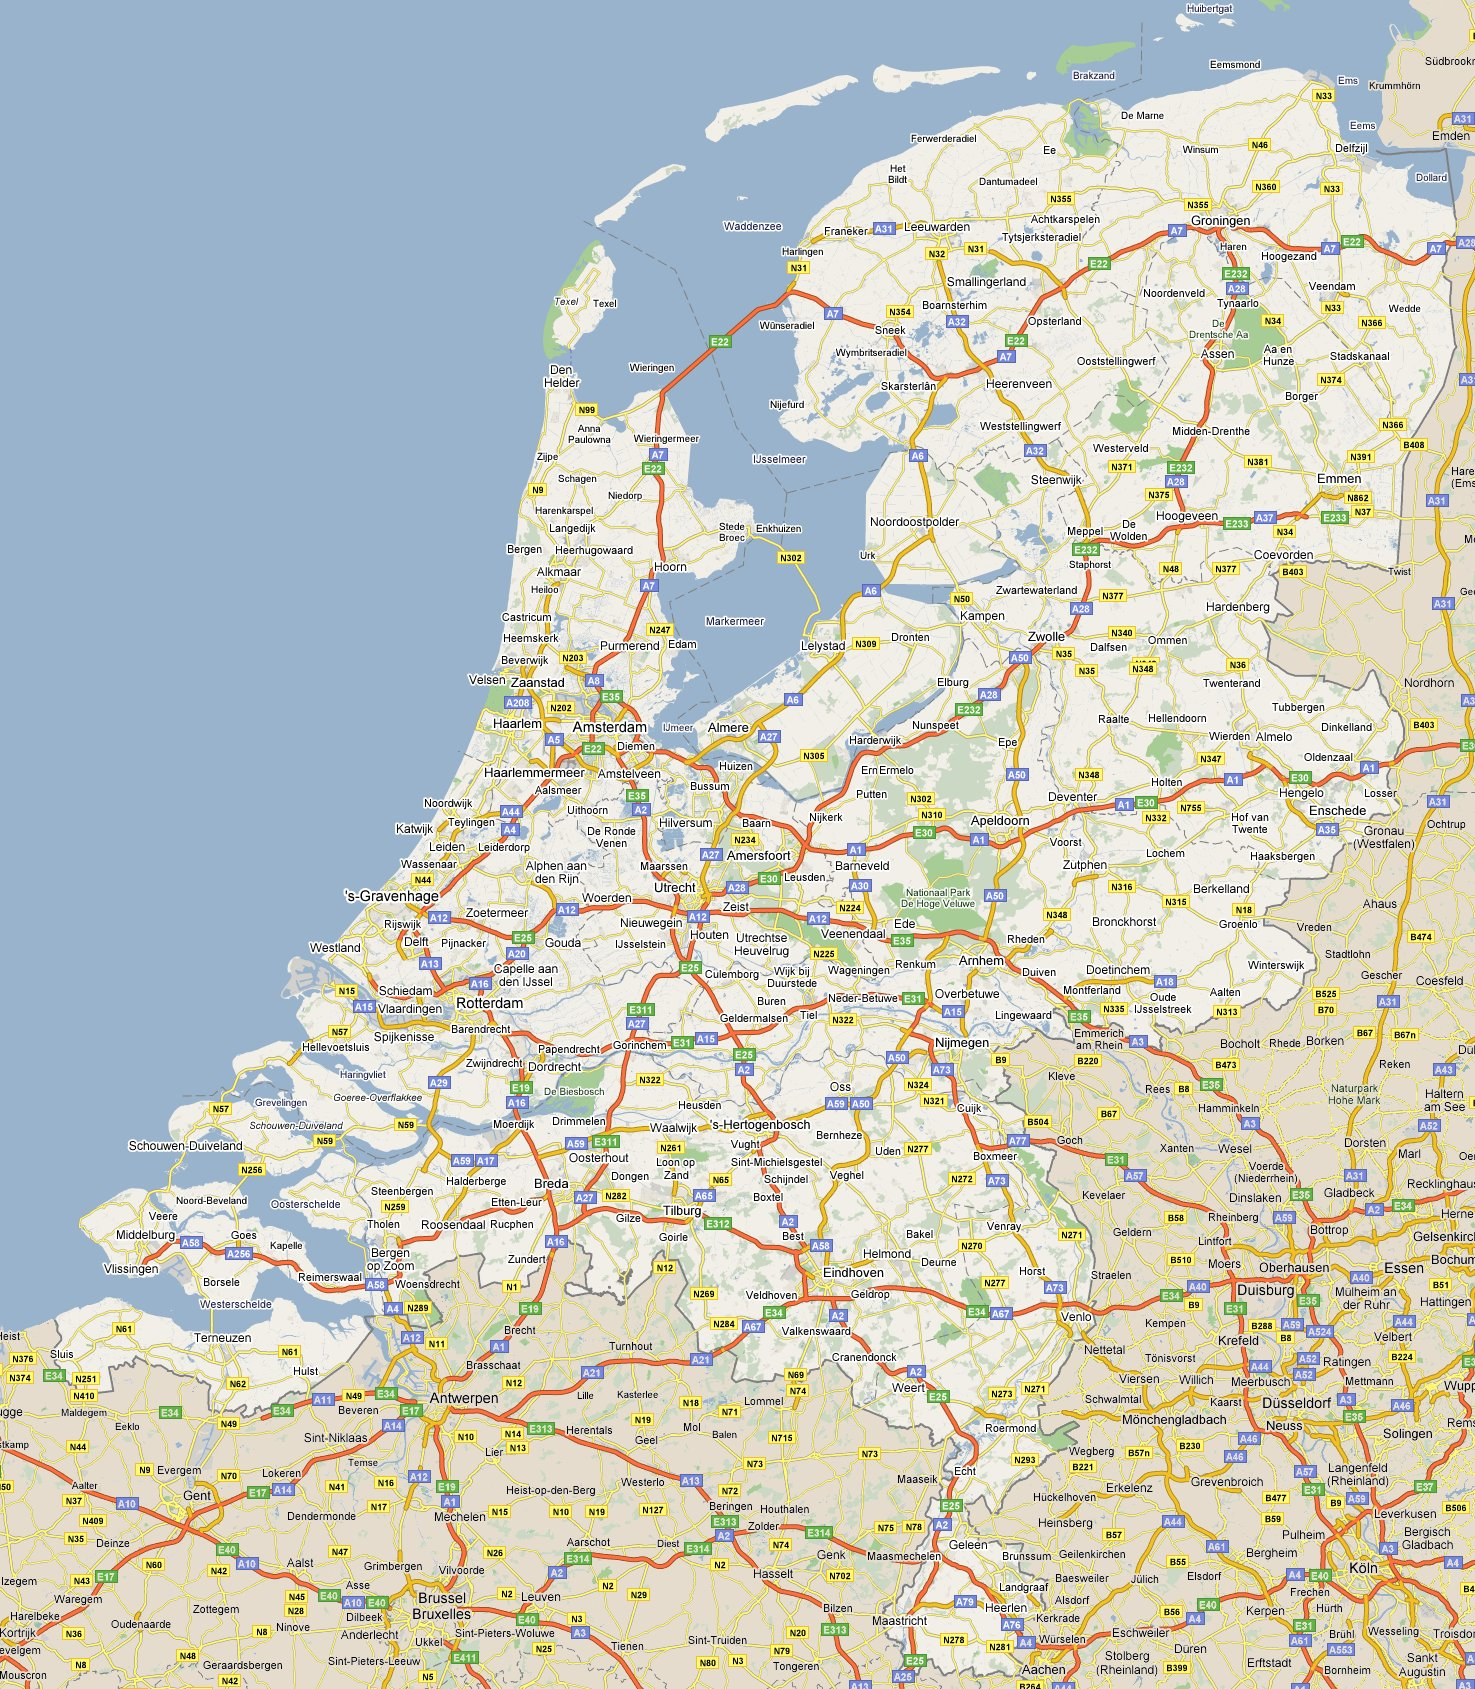 Carte Hollande Touristique.Cartograf Fr Les Pays Bas Page 2